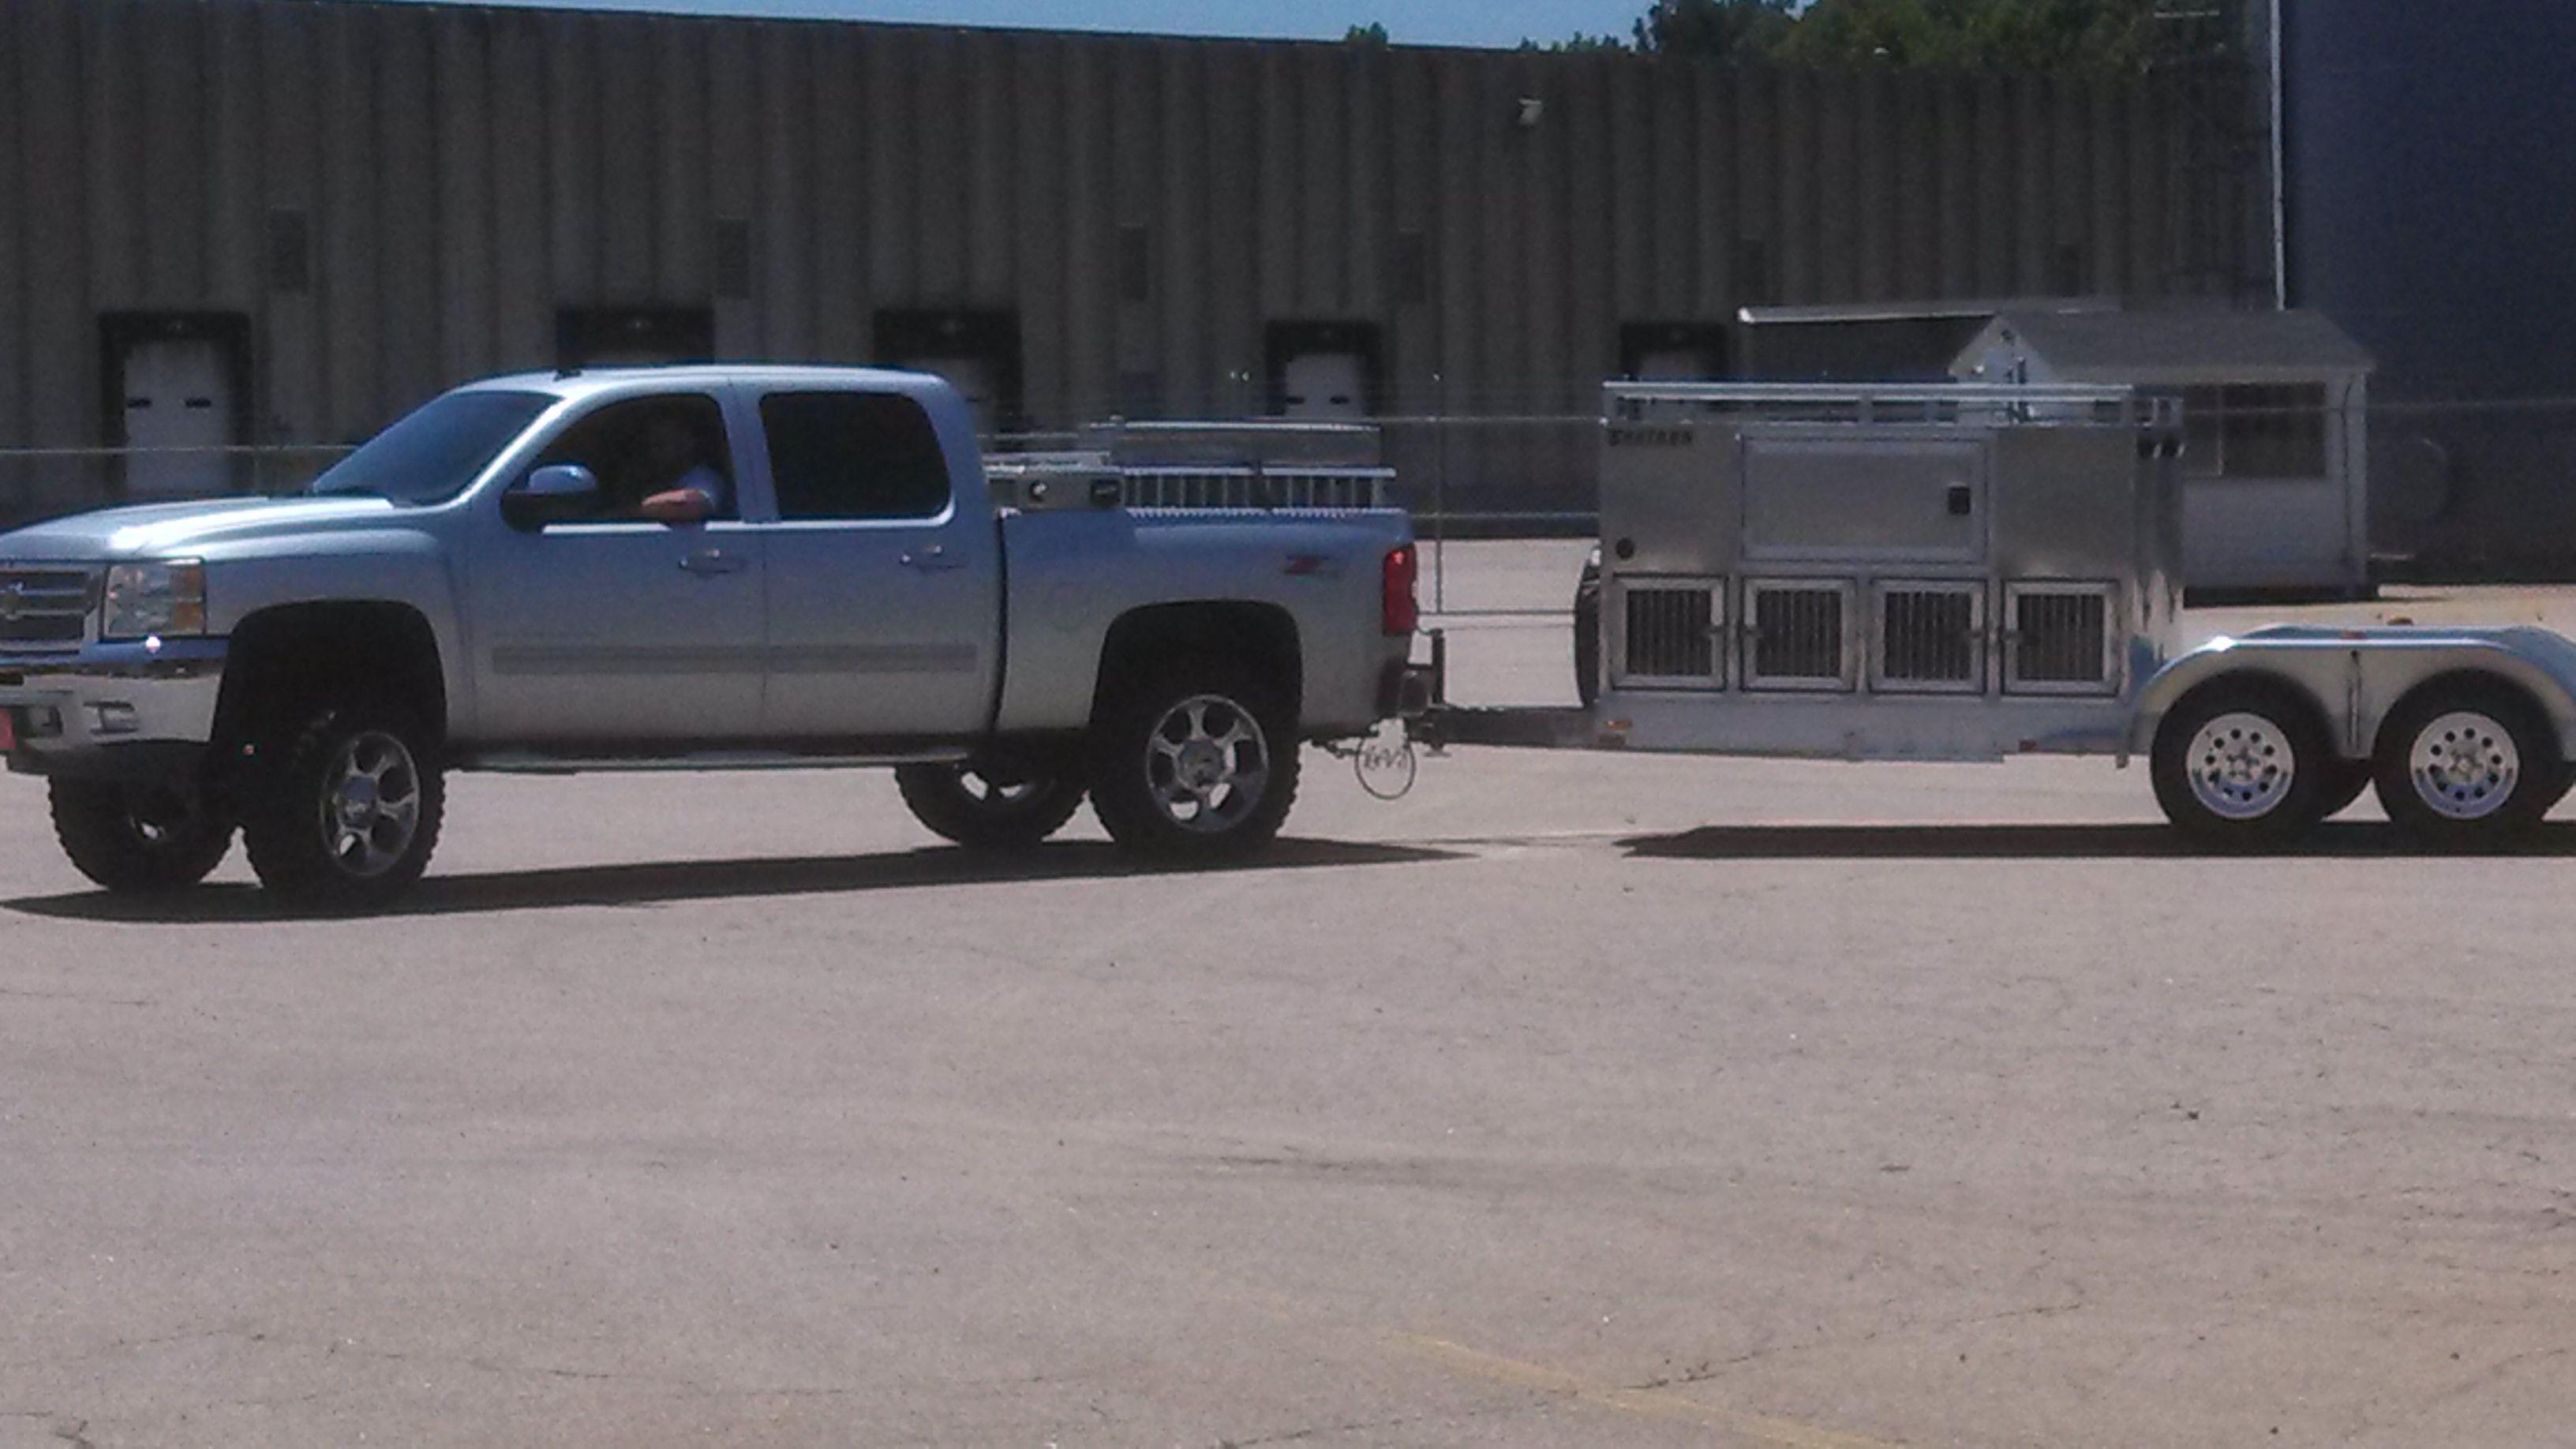 Dog Trailer hunting dog trailer with room for 4-wheeler on rear! | dog